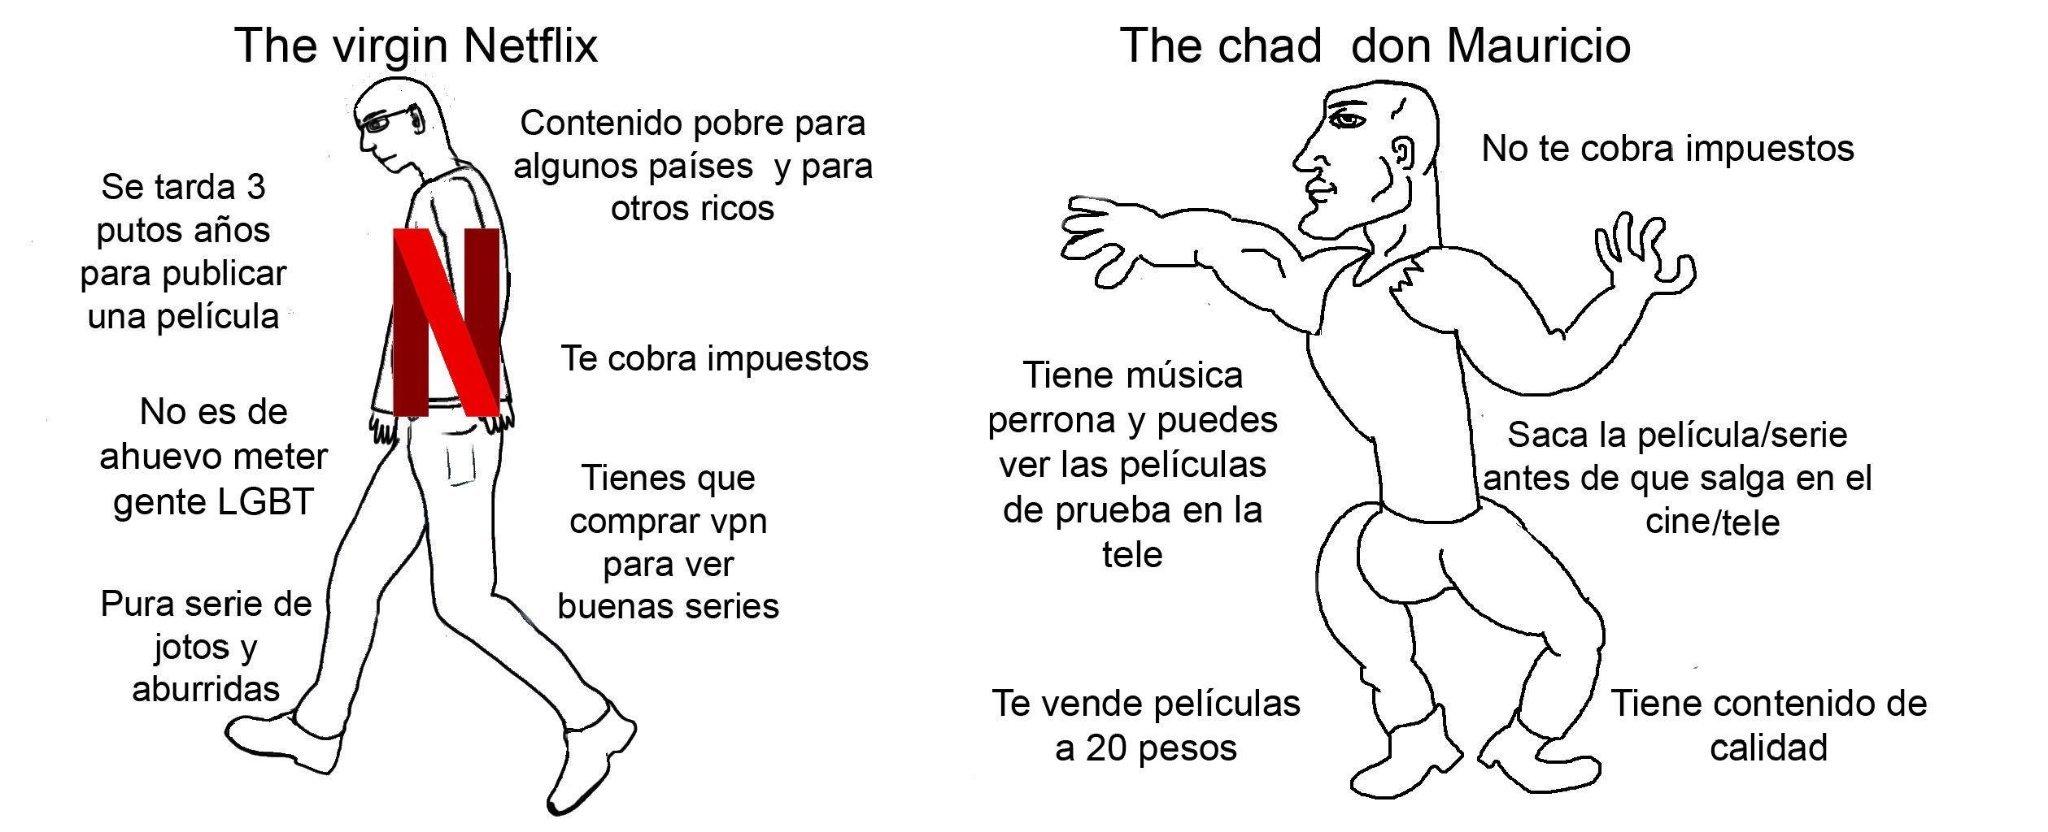 1kpo el Mauricio - meme